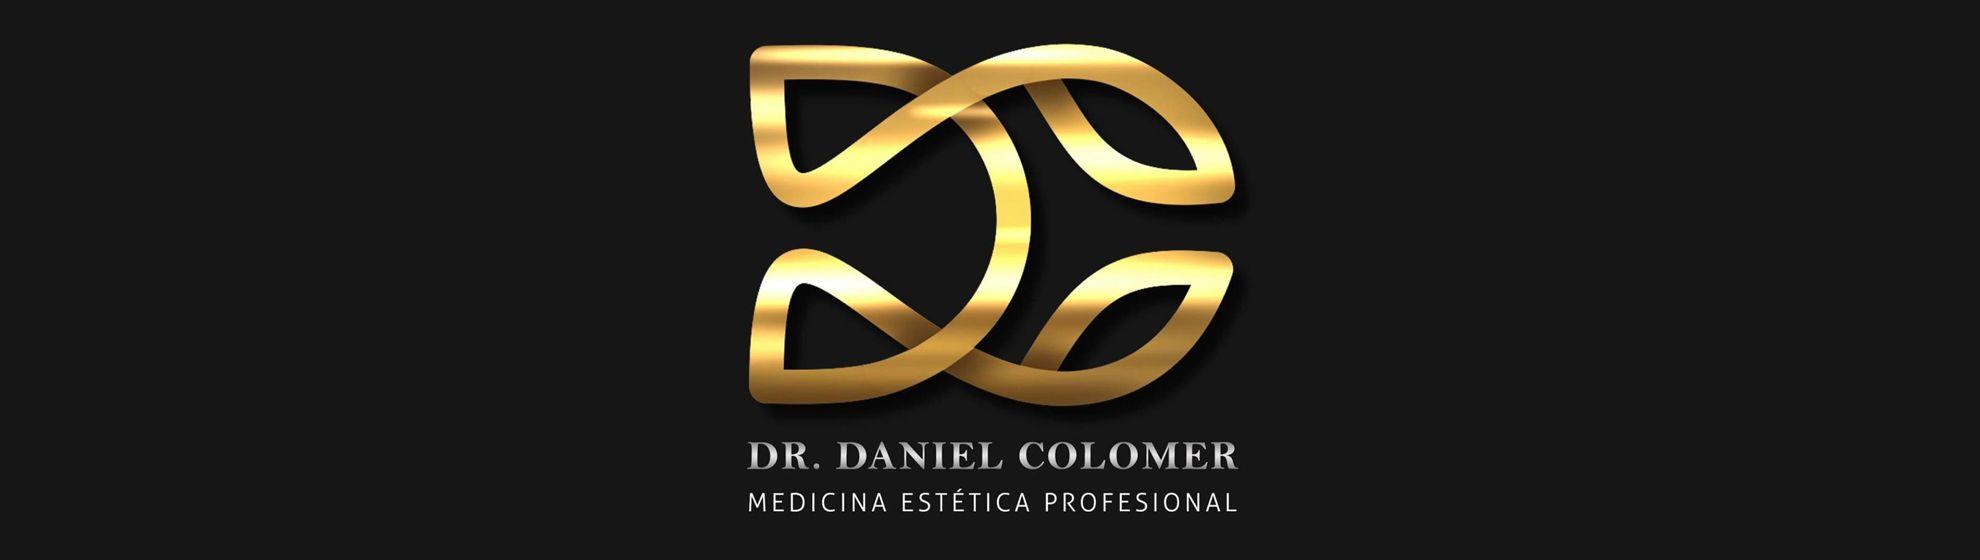 Dr. Daniel Colomer